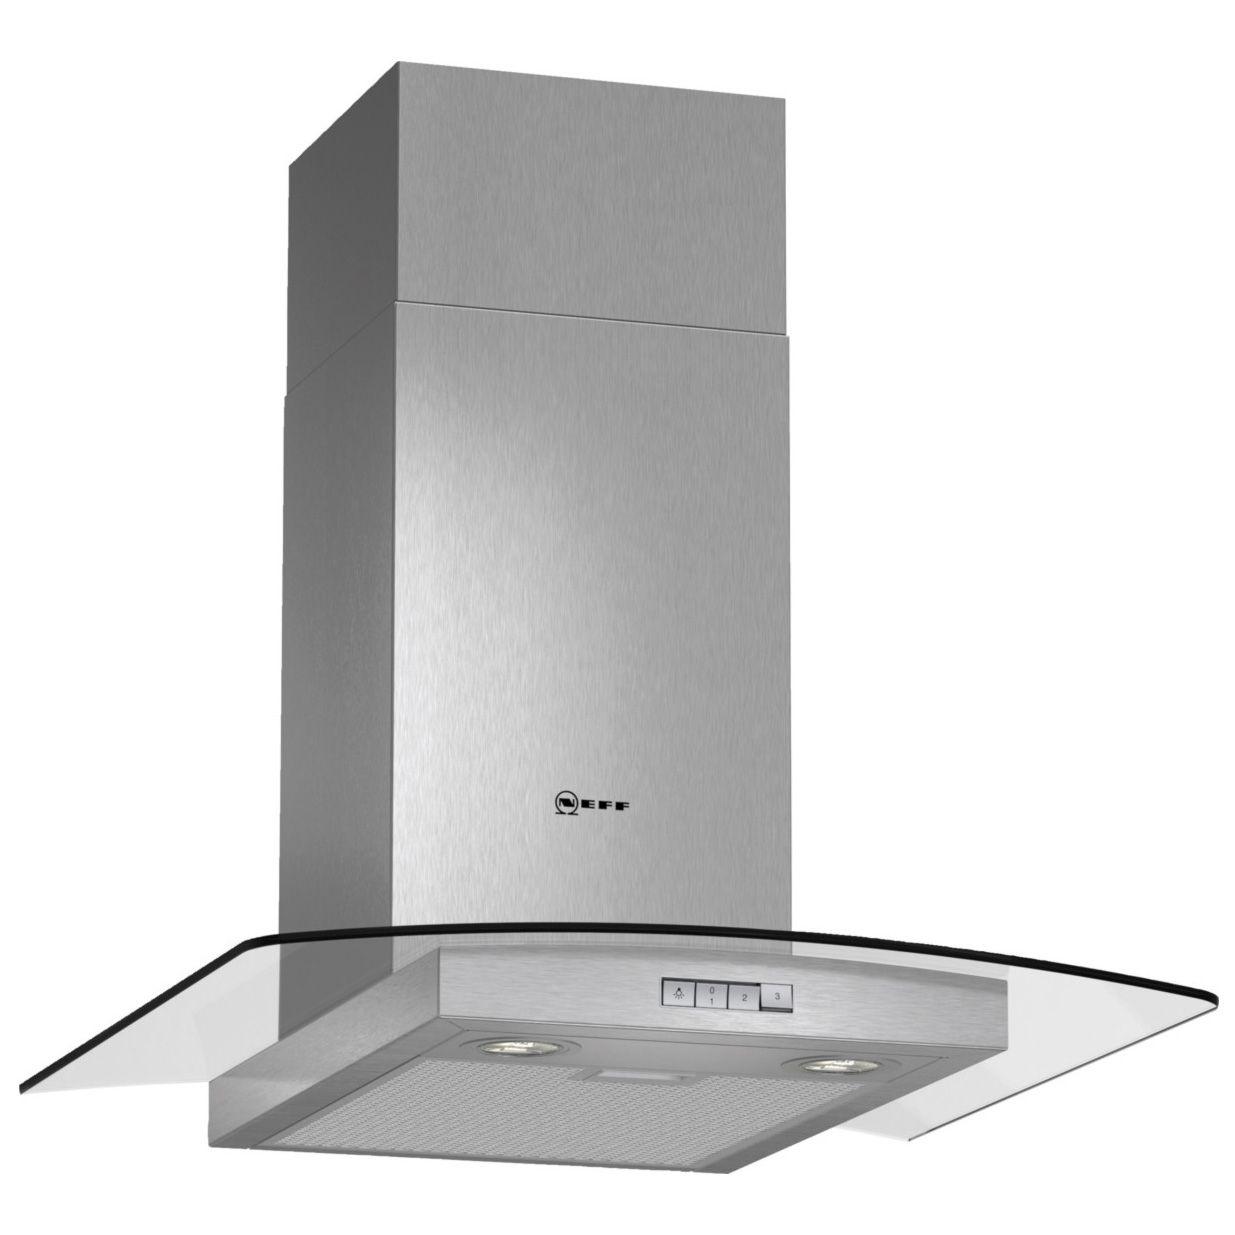 Neff D86gr22n0b Stainless Steel Effect Glass Canopy Cooker Hood, (w) 600mm